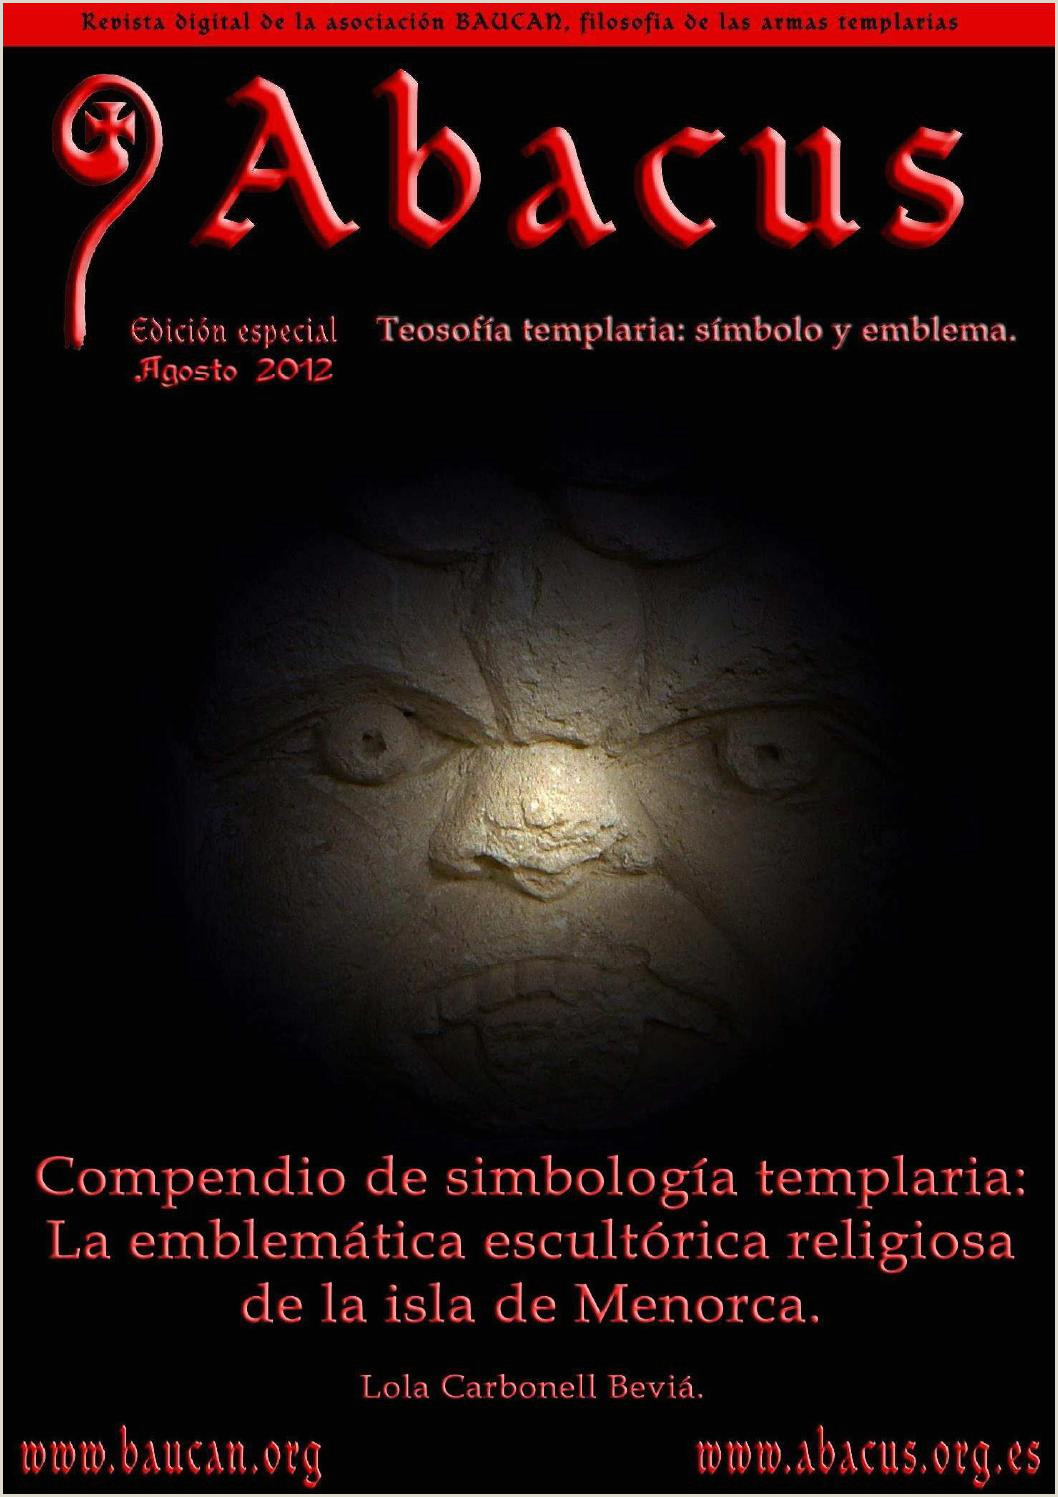 Hoja De Vida Minerva 1003 Azul Pdf Pendio De Simbologa Templaria by Abacus Revista Digital